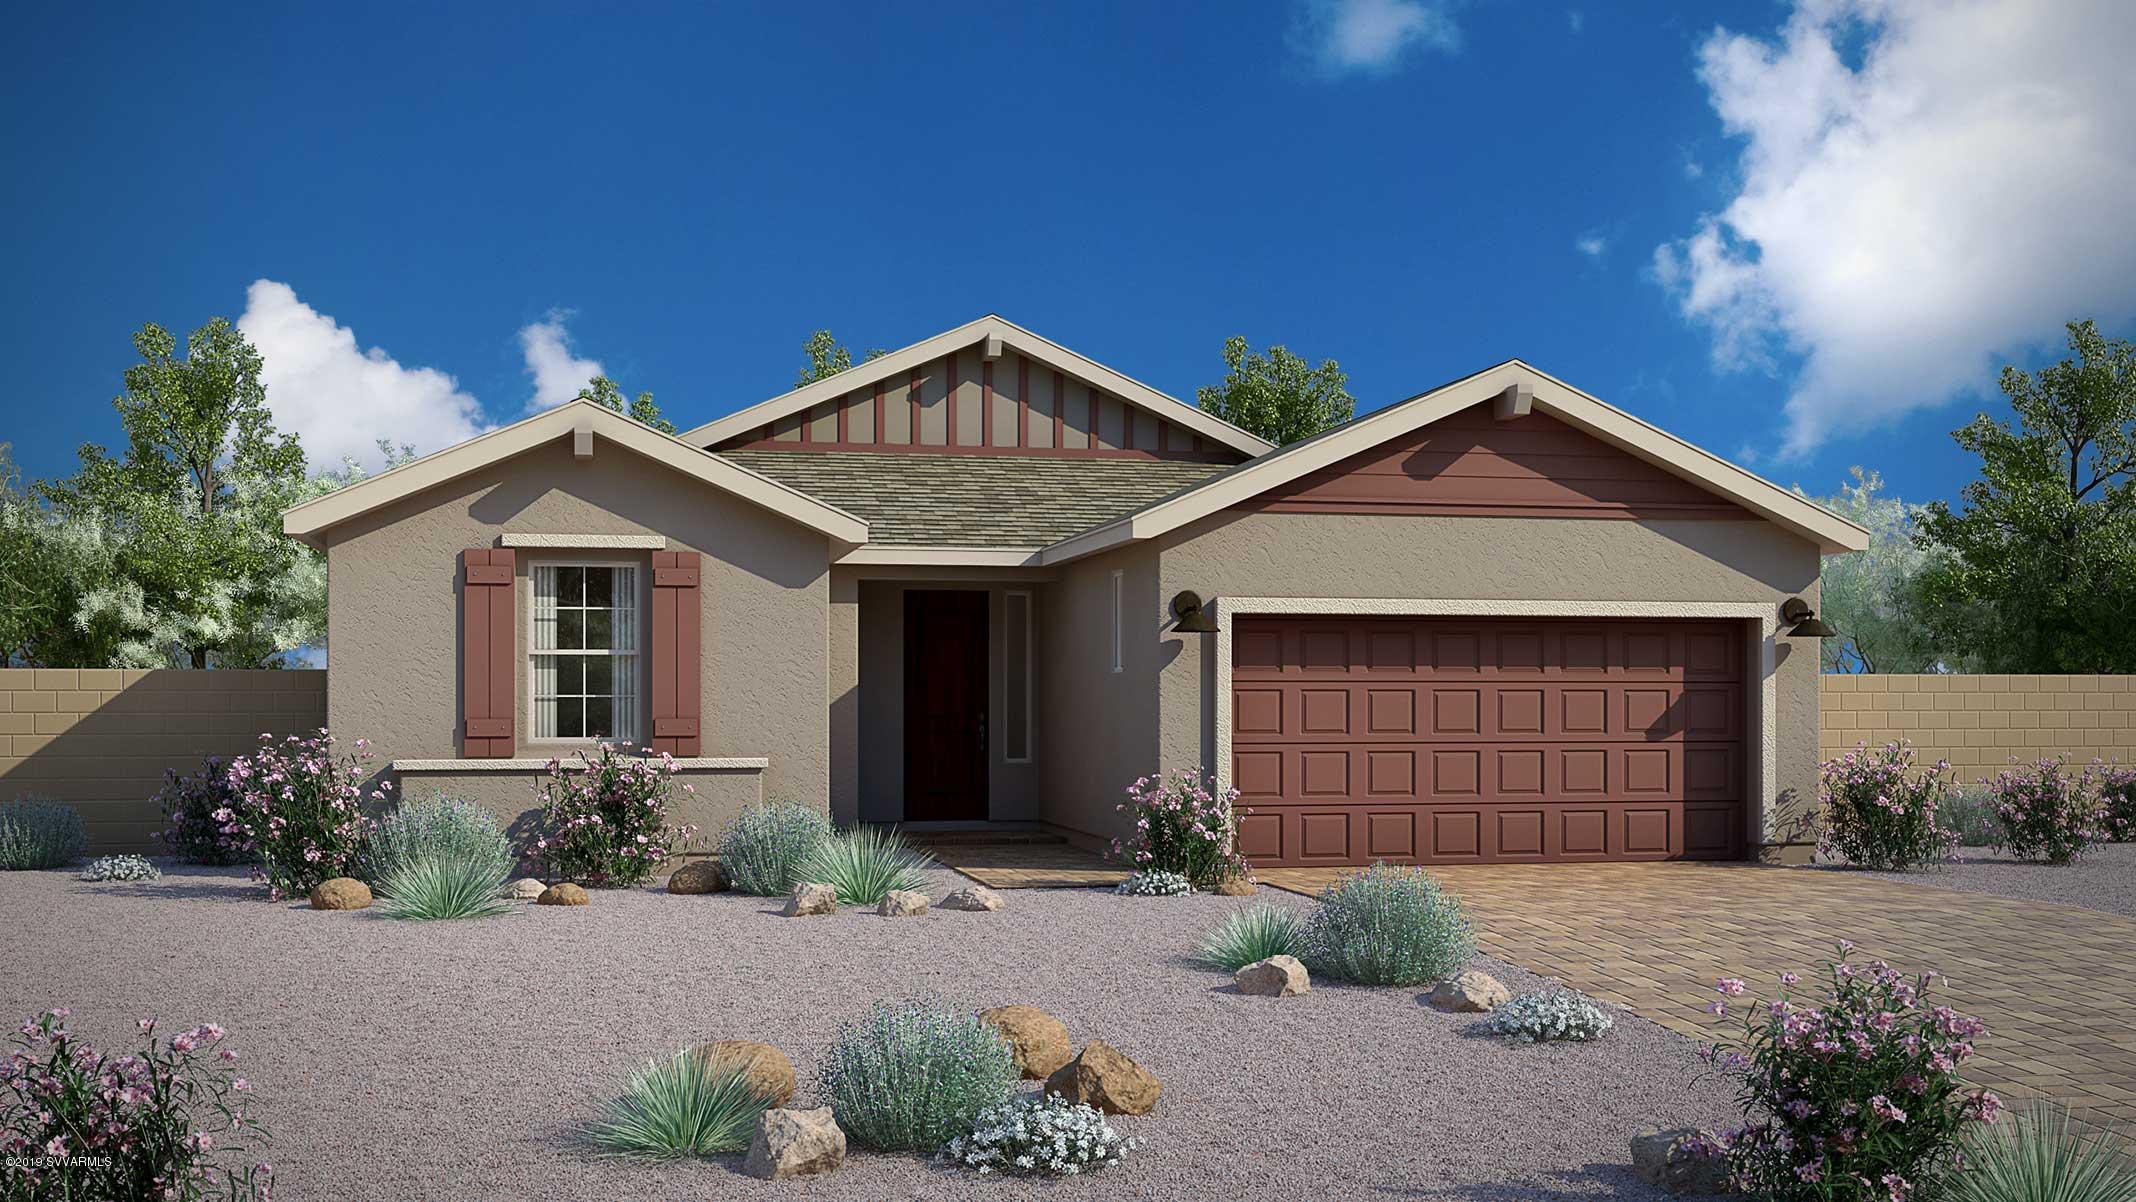 260 Sieber Court Clarkdale, AZ 86324